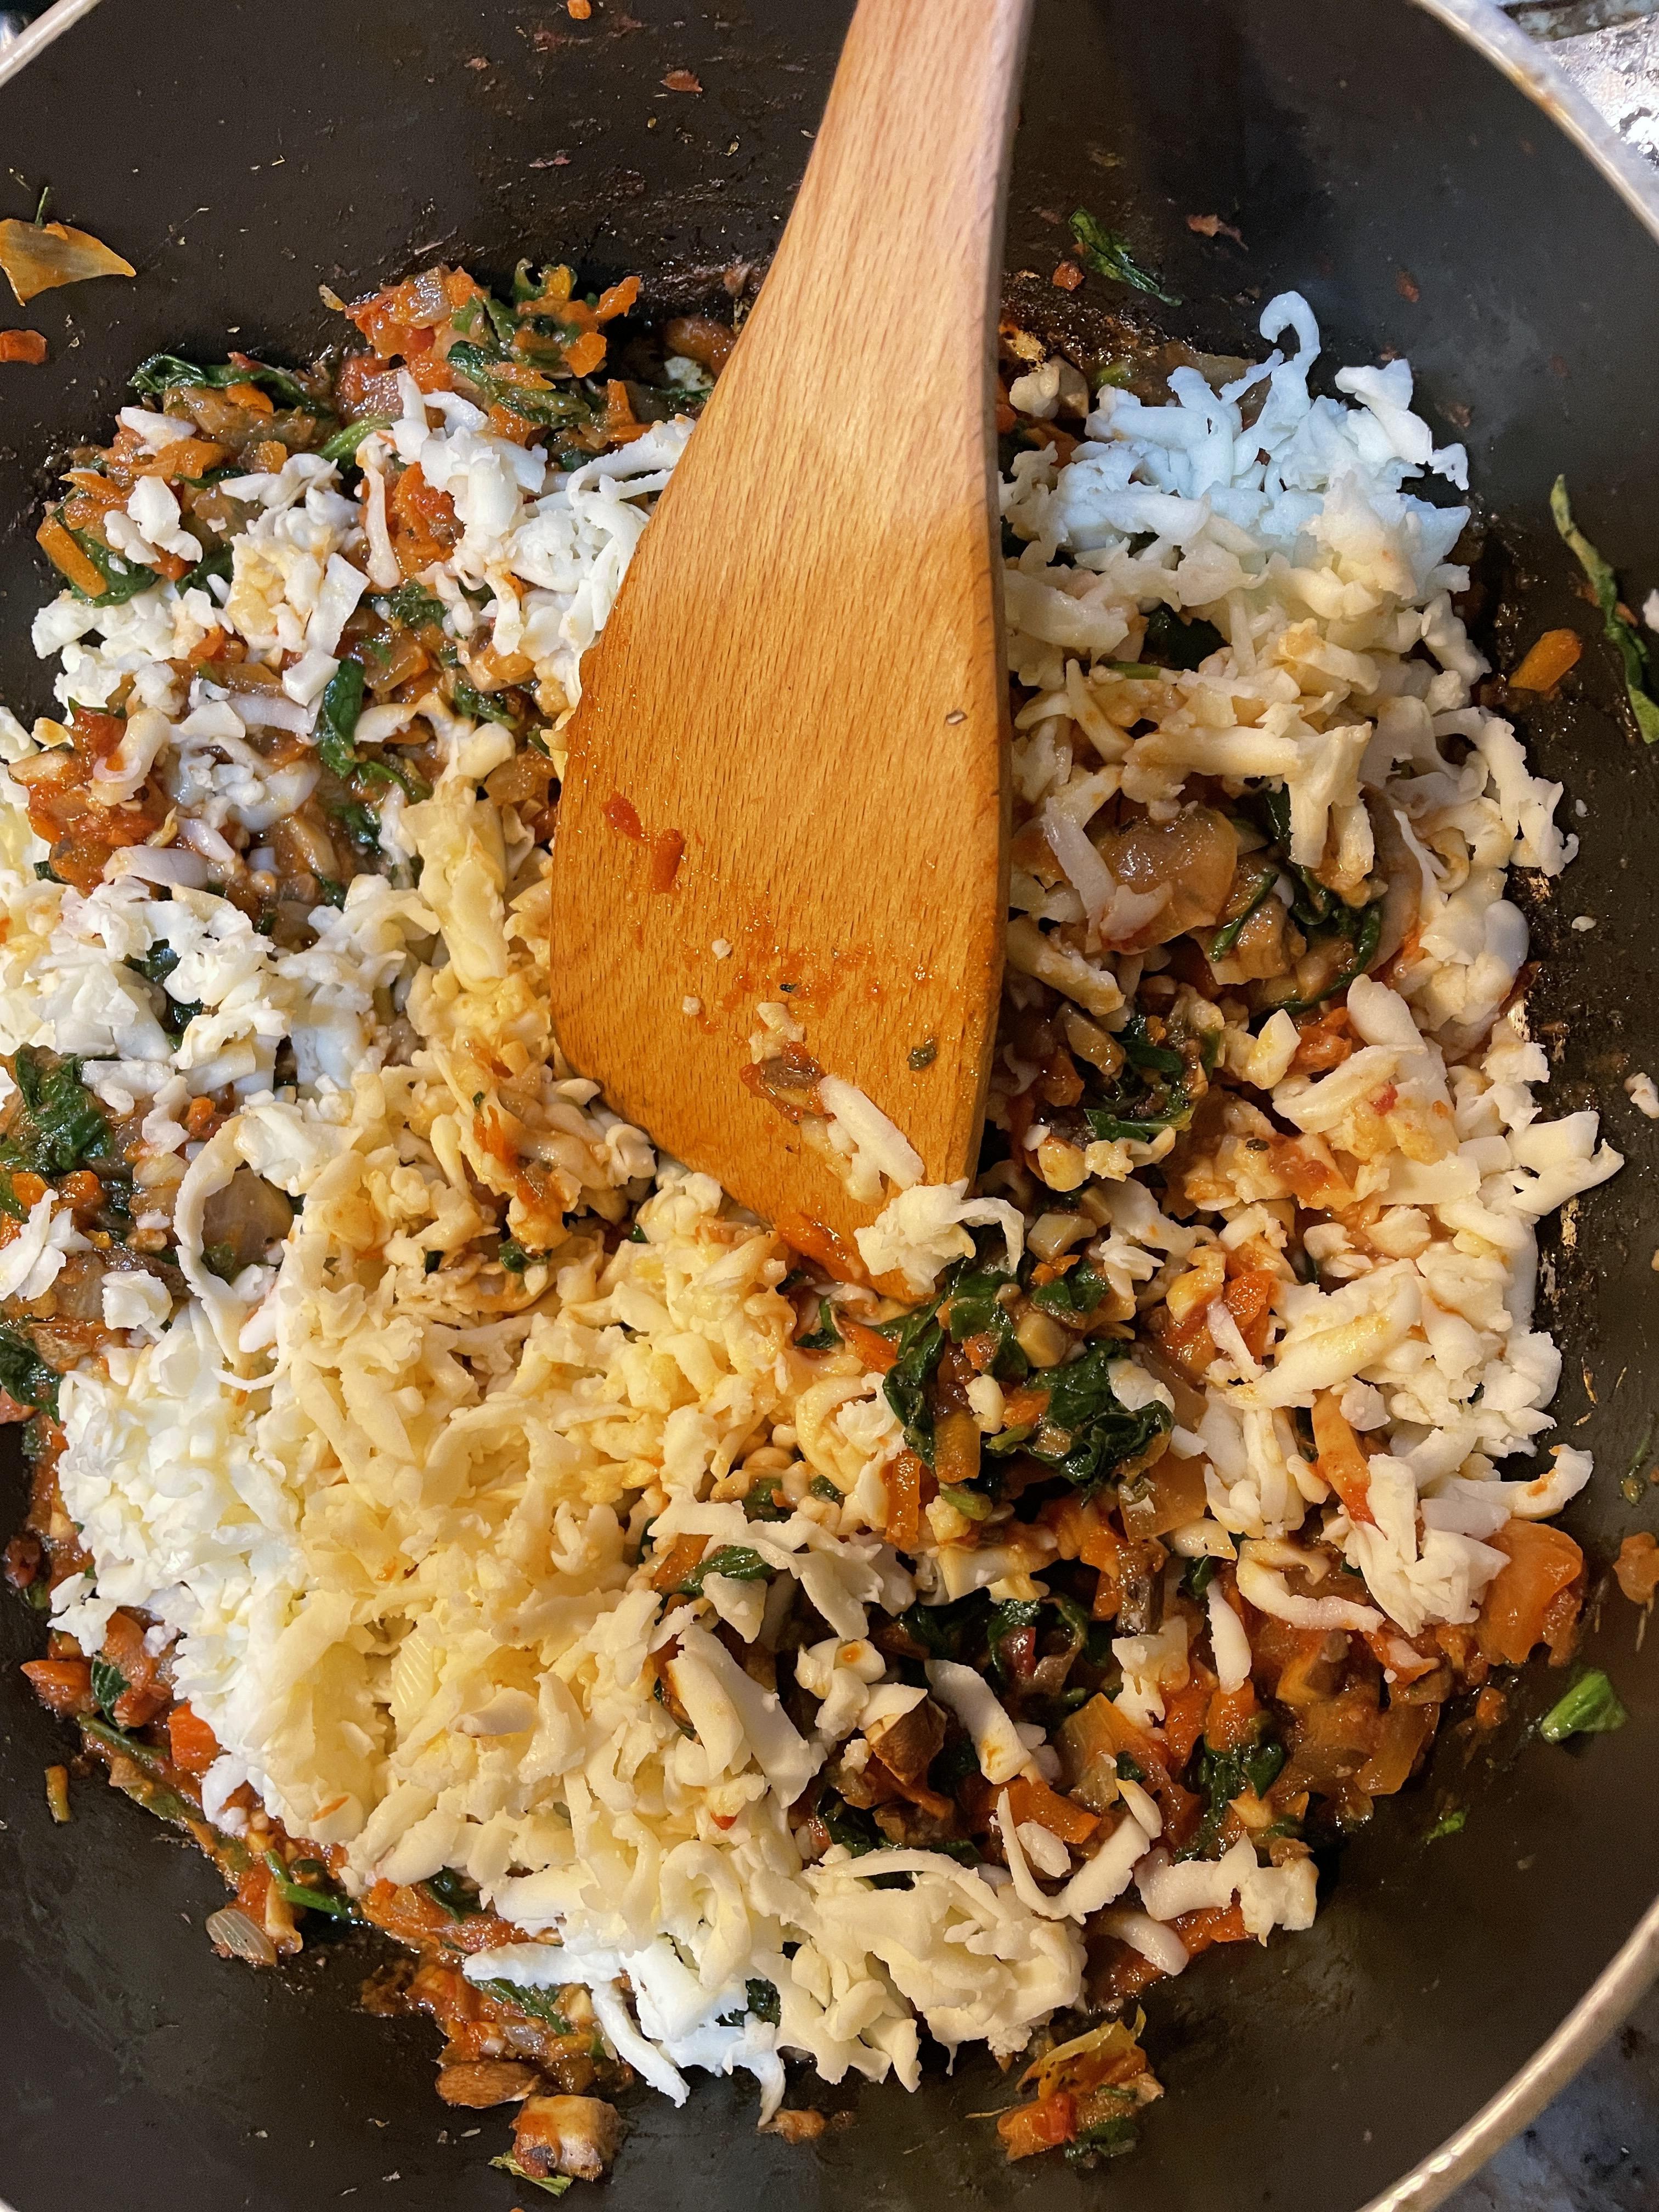 Add loads of mozzarella and parmesan